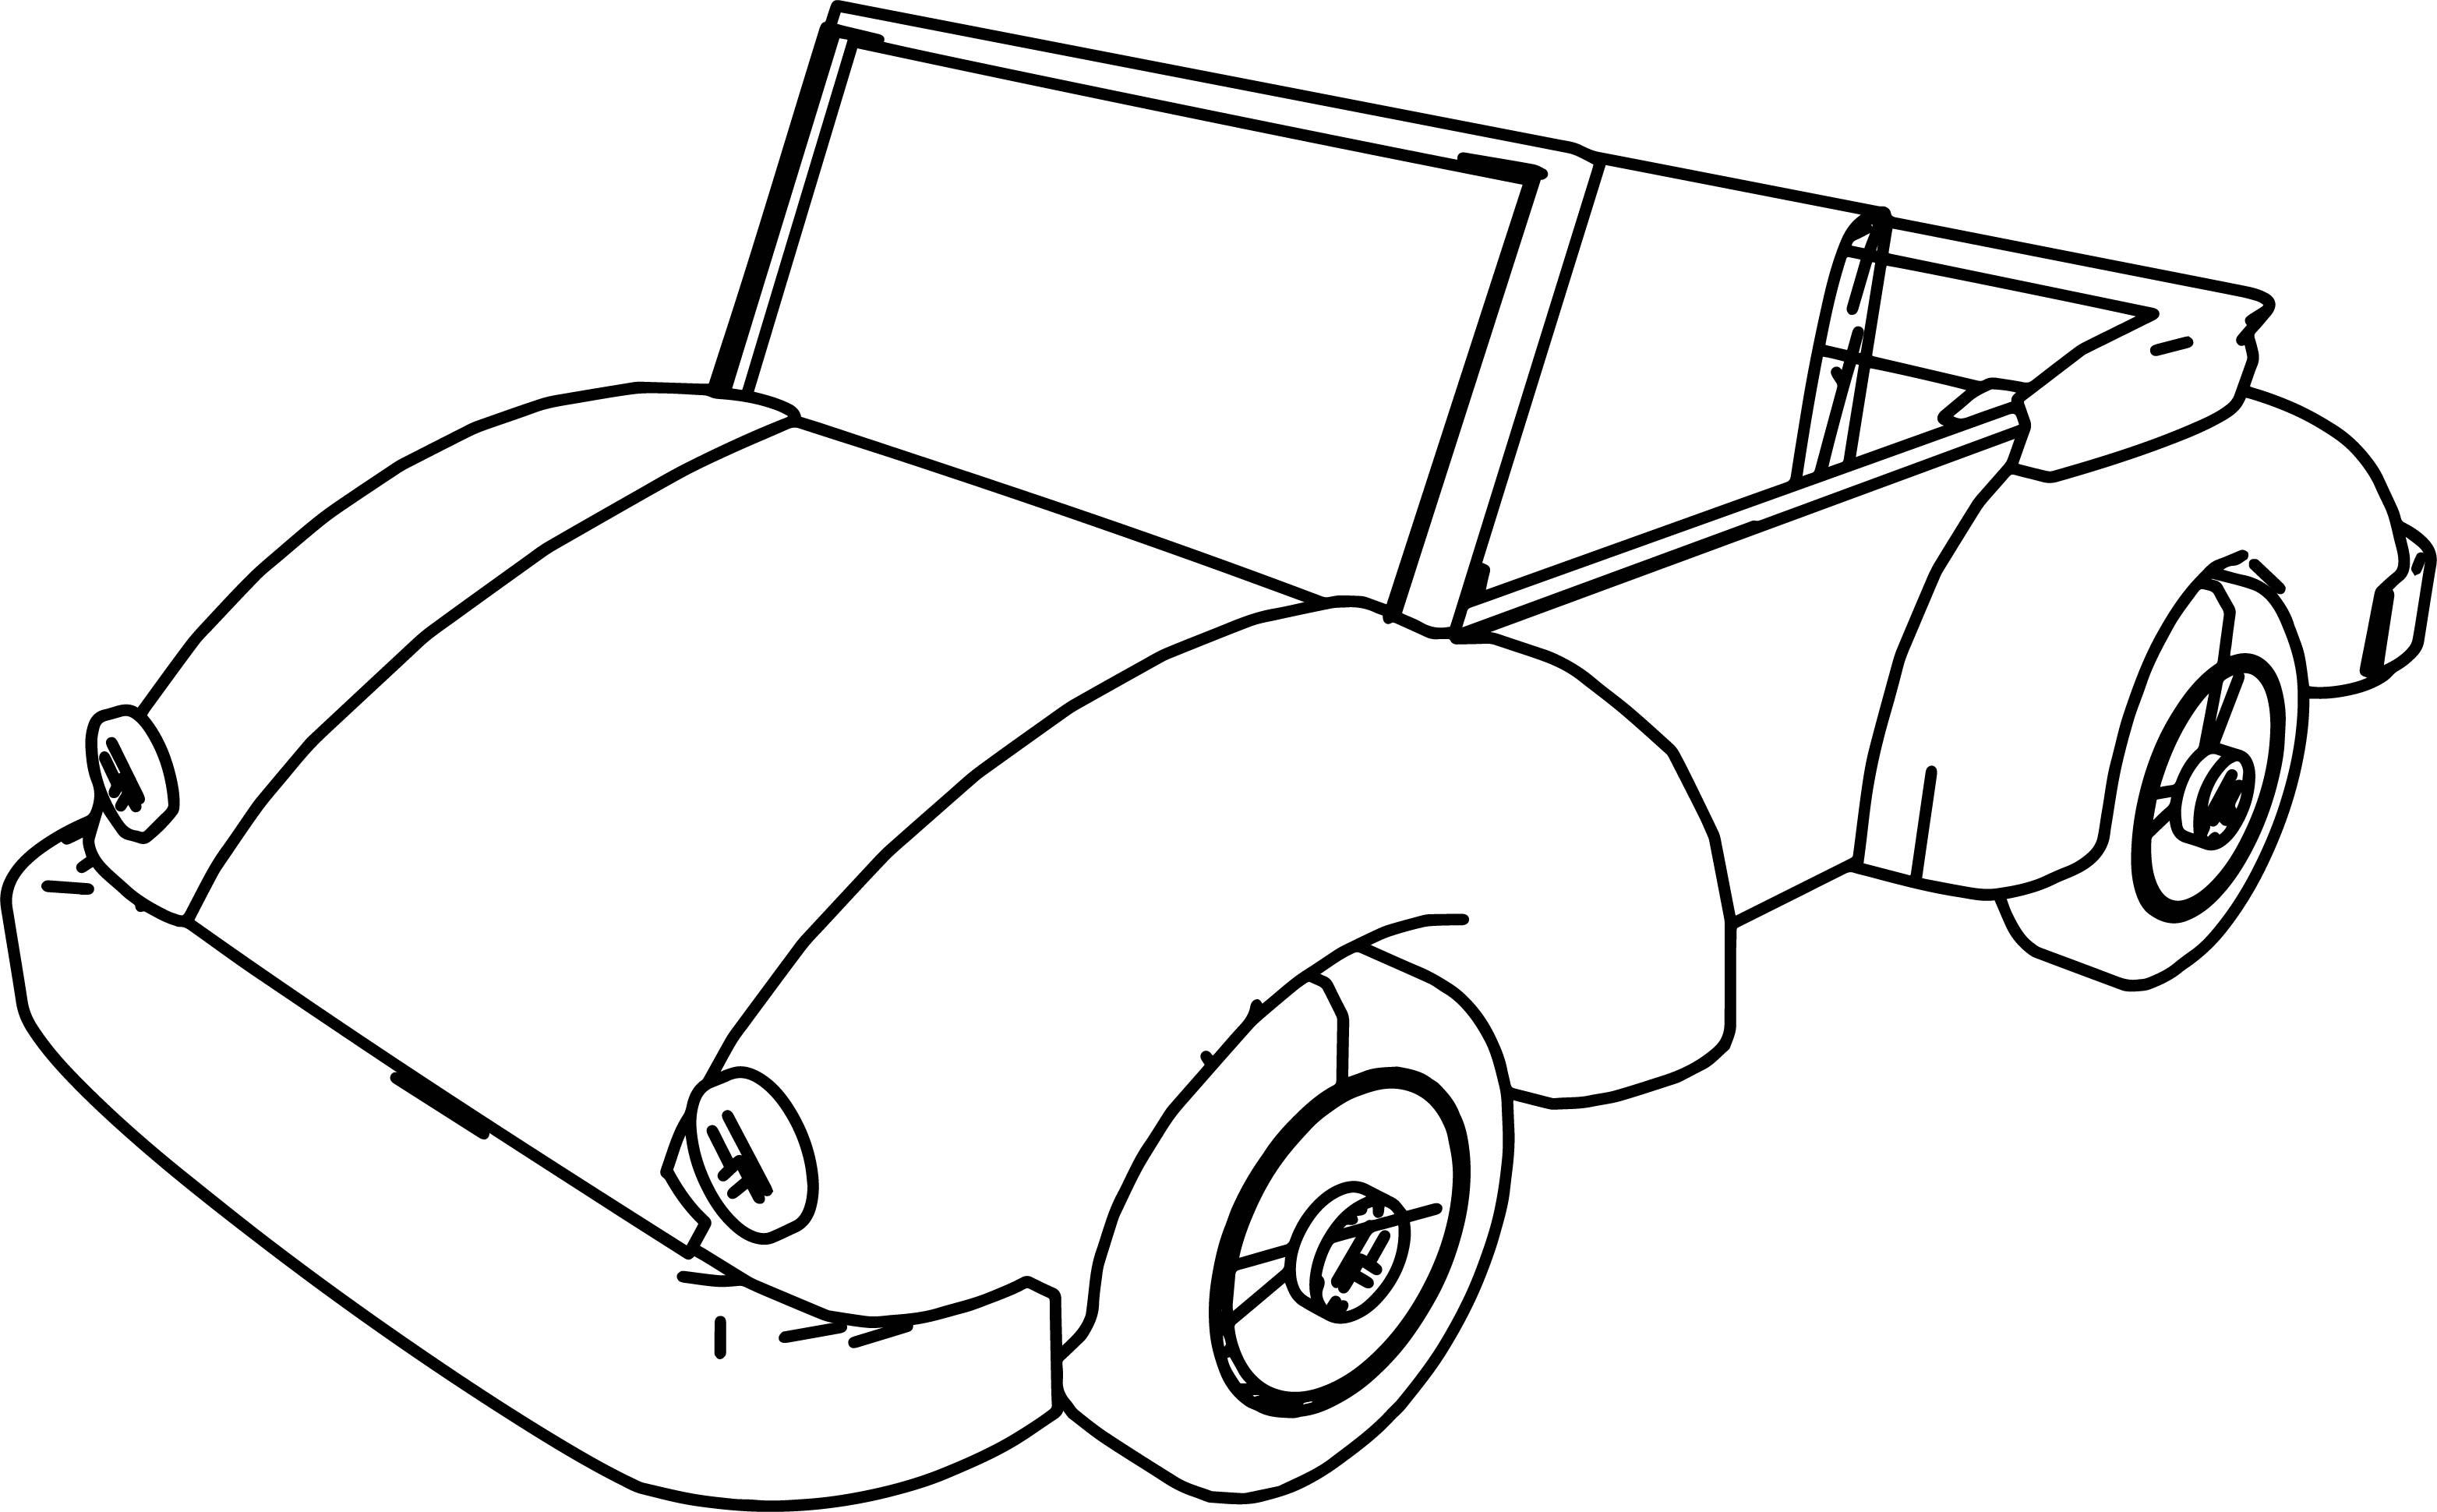 Car Drawing Cartoon at GetDrawings.com | Free for personal use Car ...